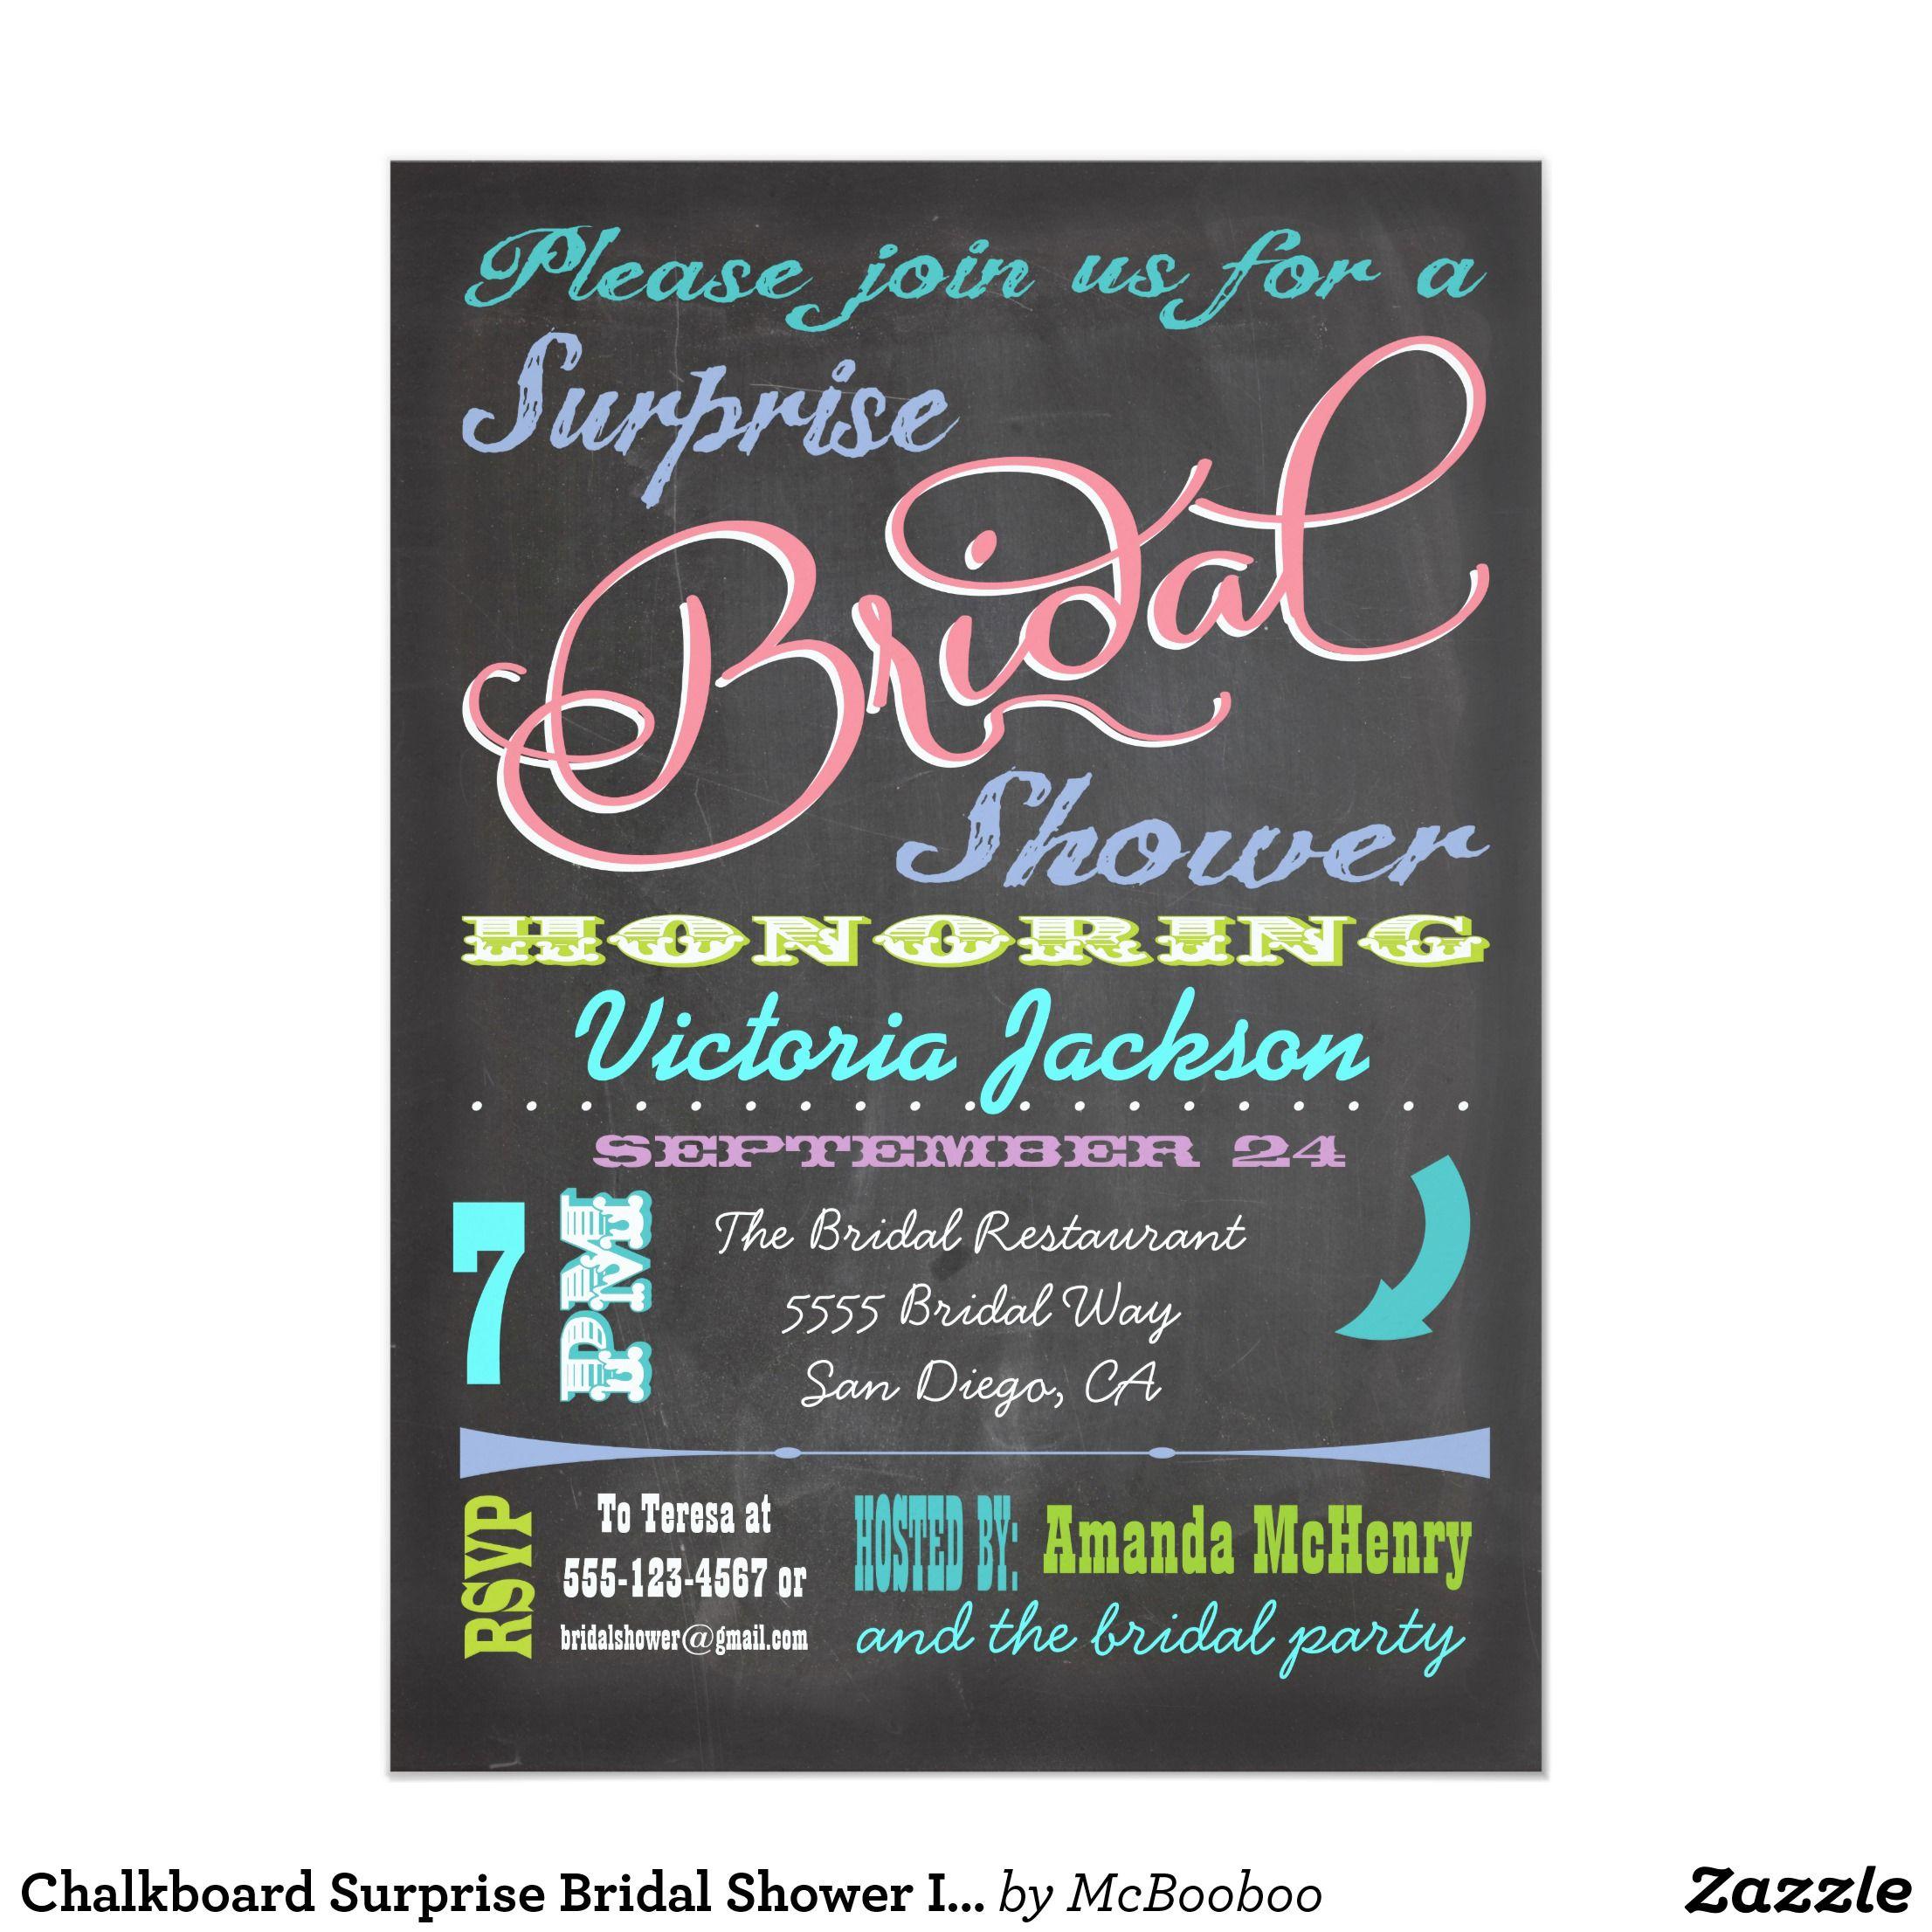 Chalkboard Surprise Bridal Shower Invitations Bridal Showers